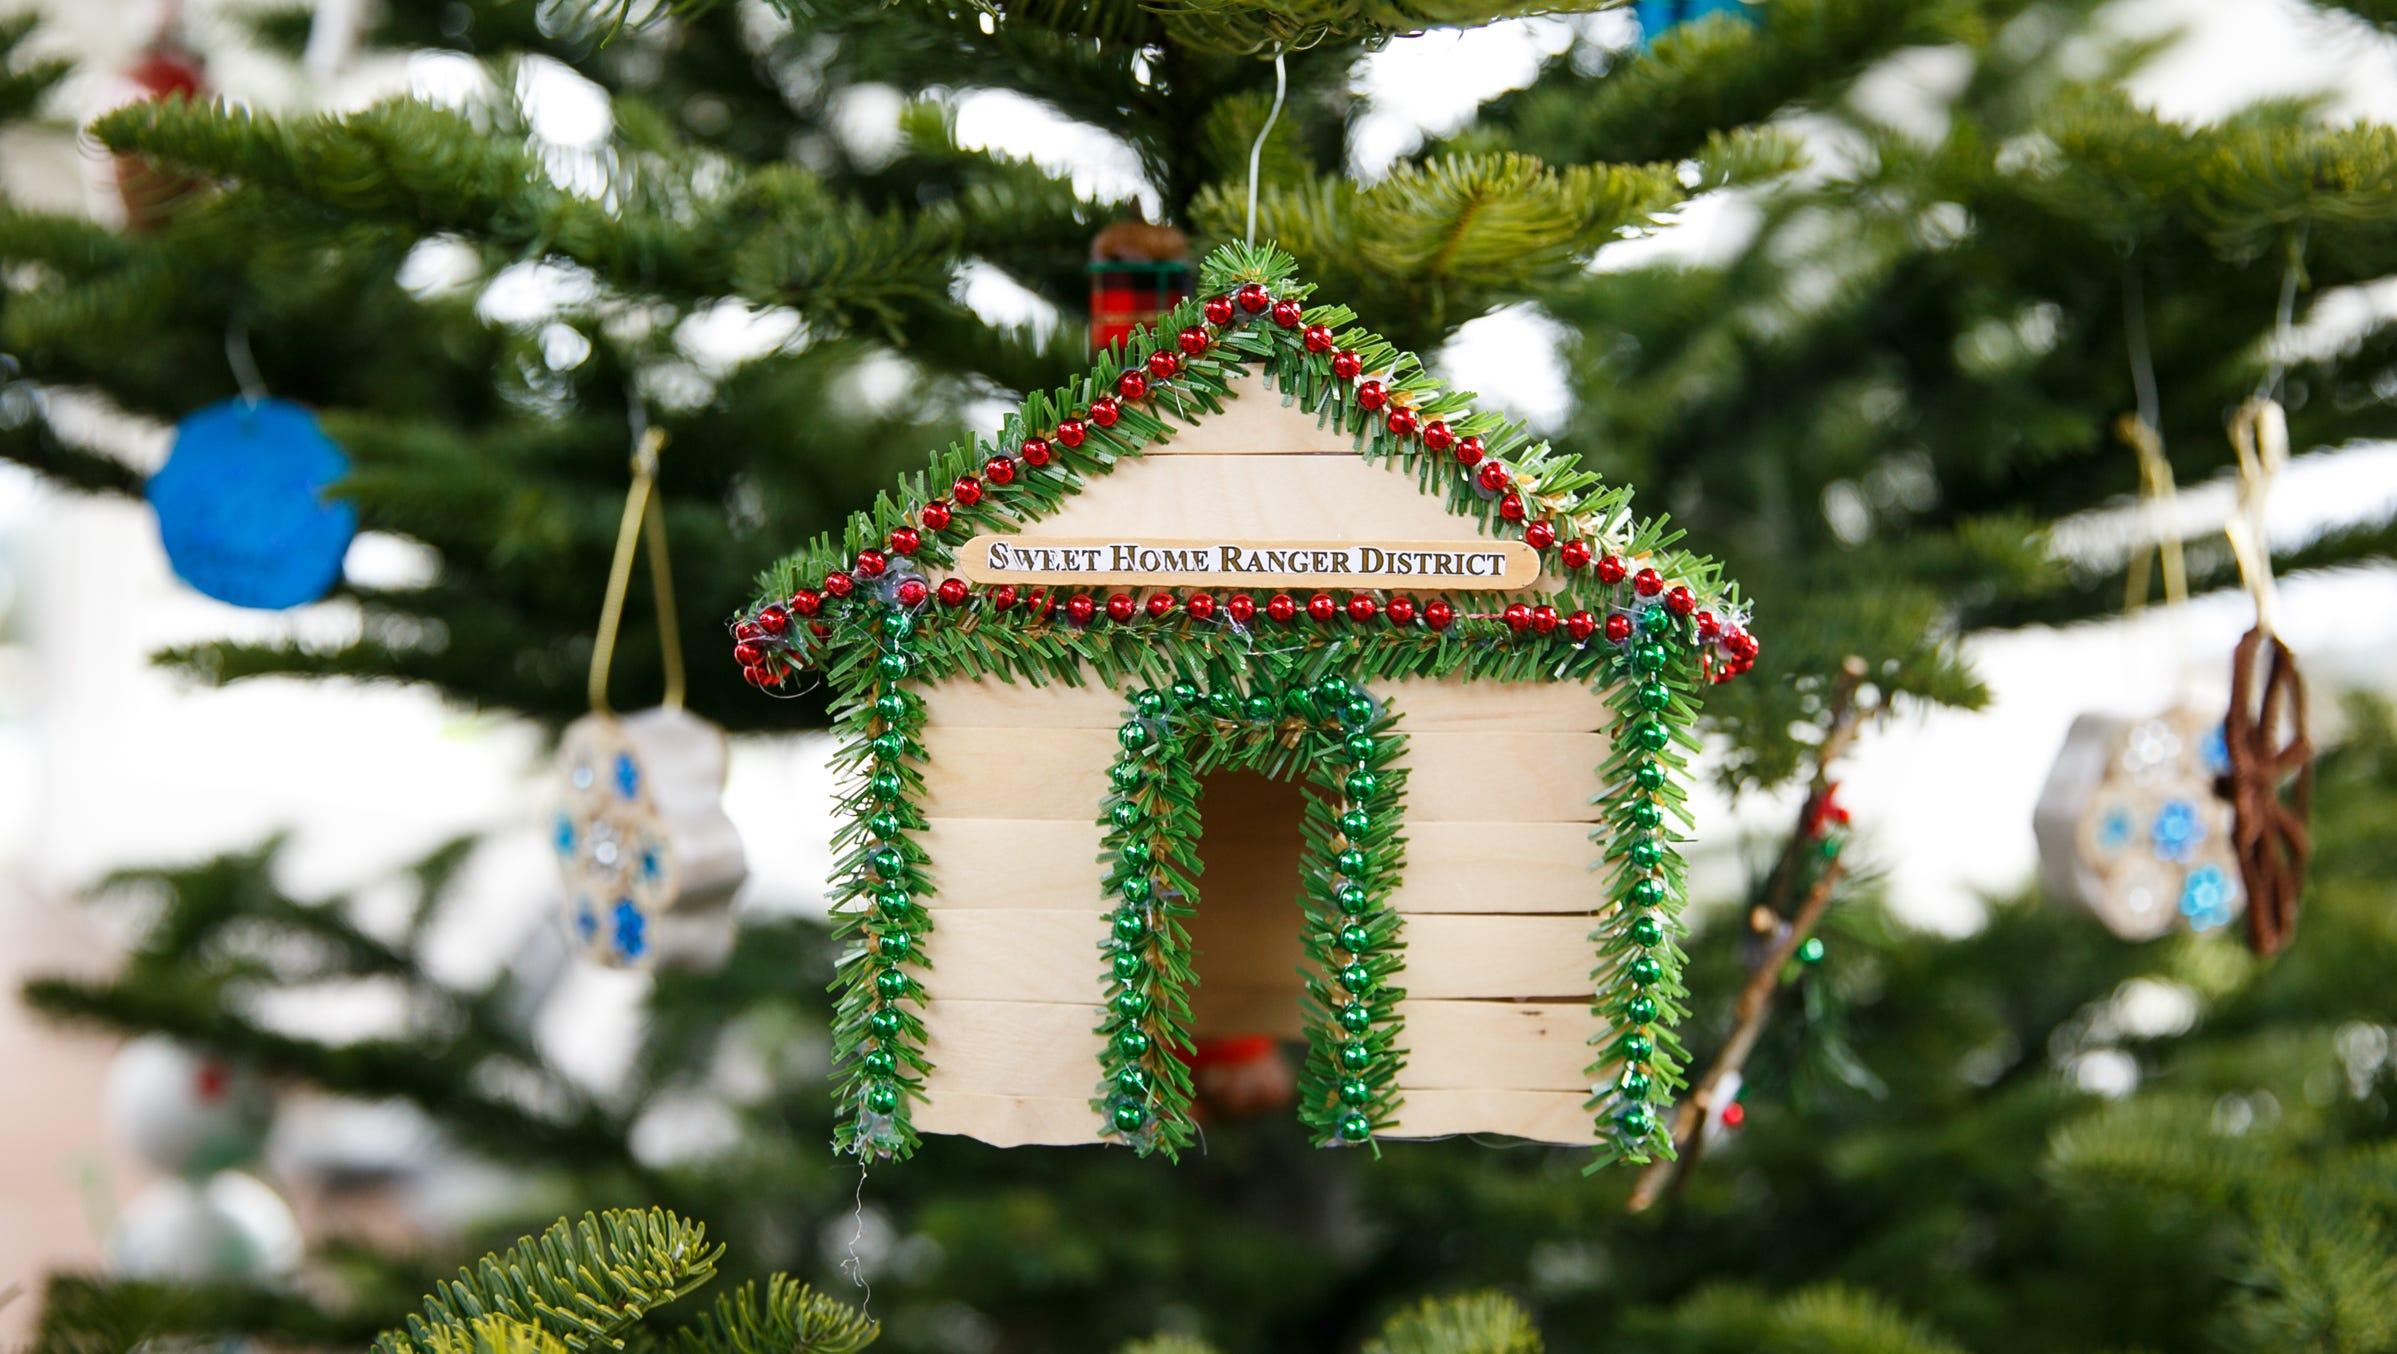 Jan. 19, 2021 And Christmas Tree And Sweet Home Oregon 2018 U S Capitol Christmas Tree Will Be Cut Near Sweet Home Oregon